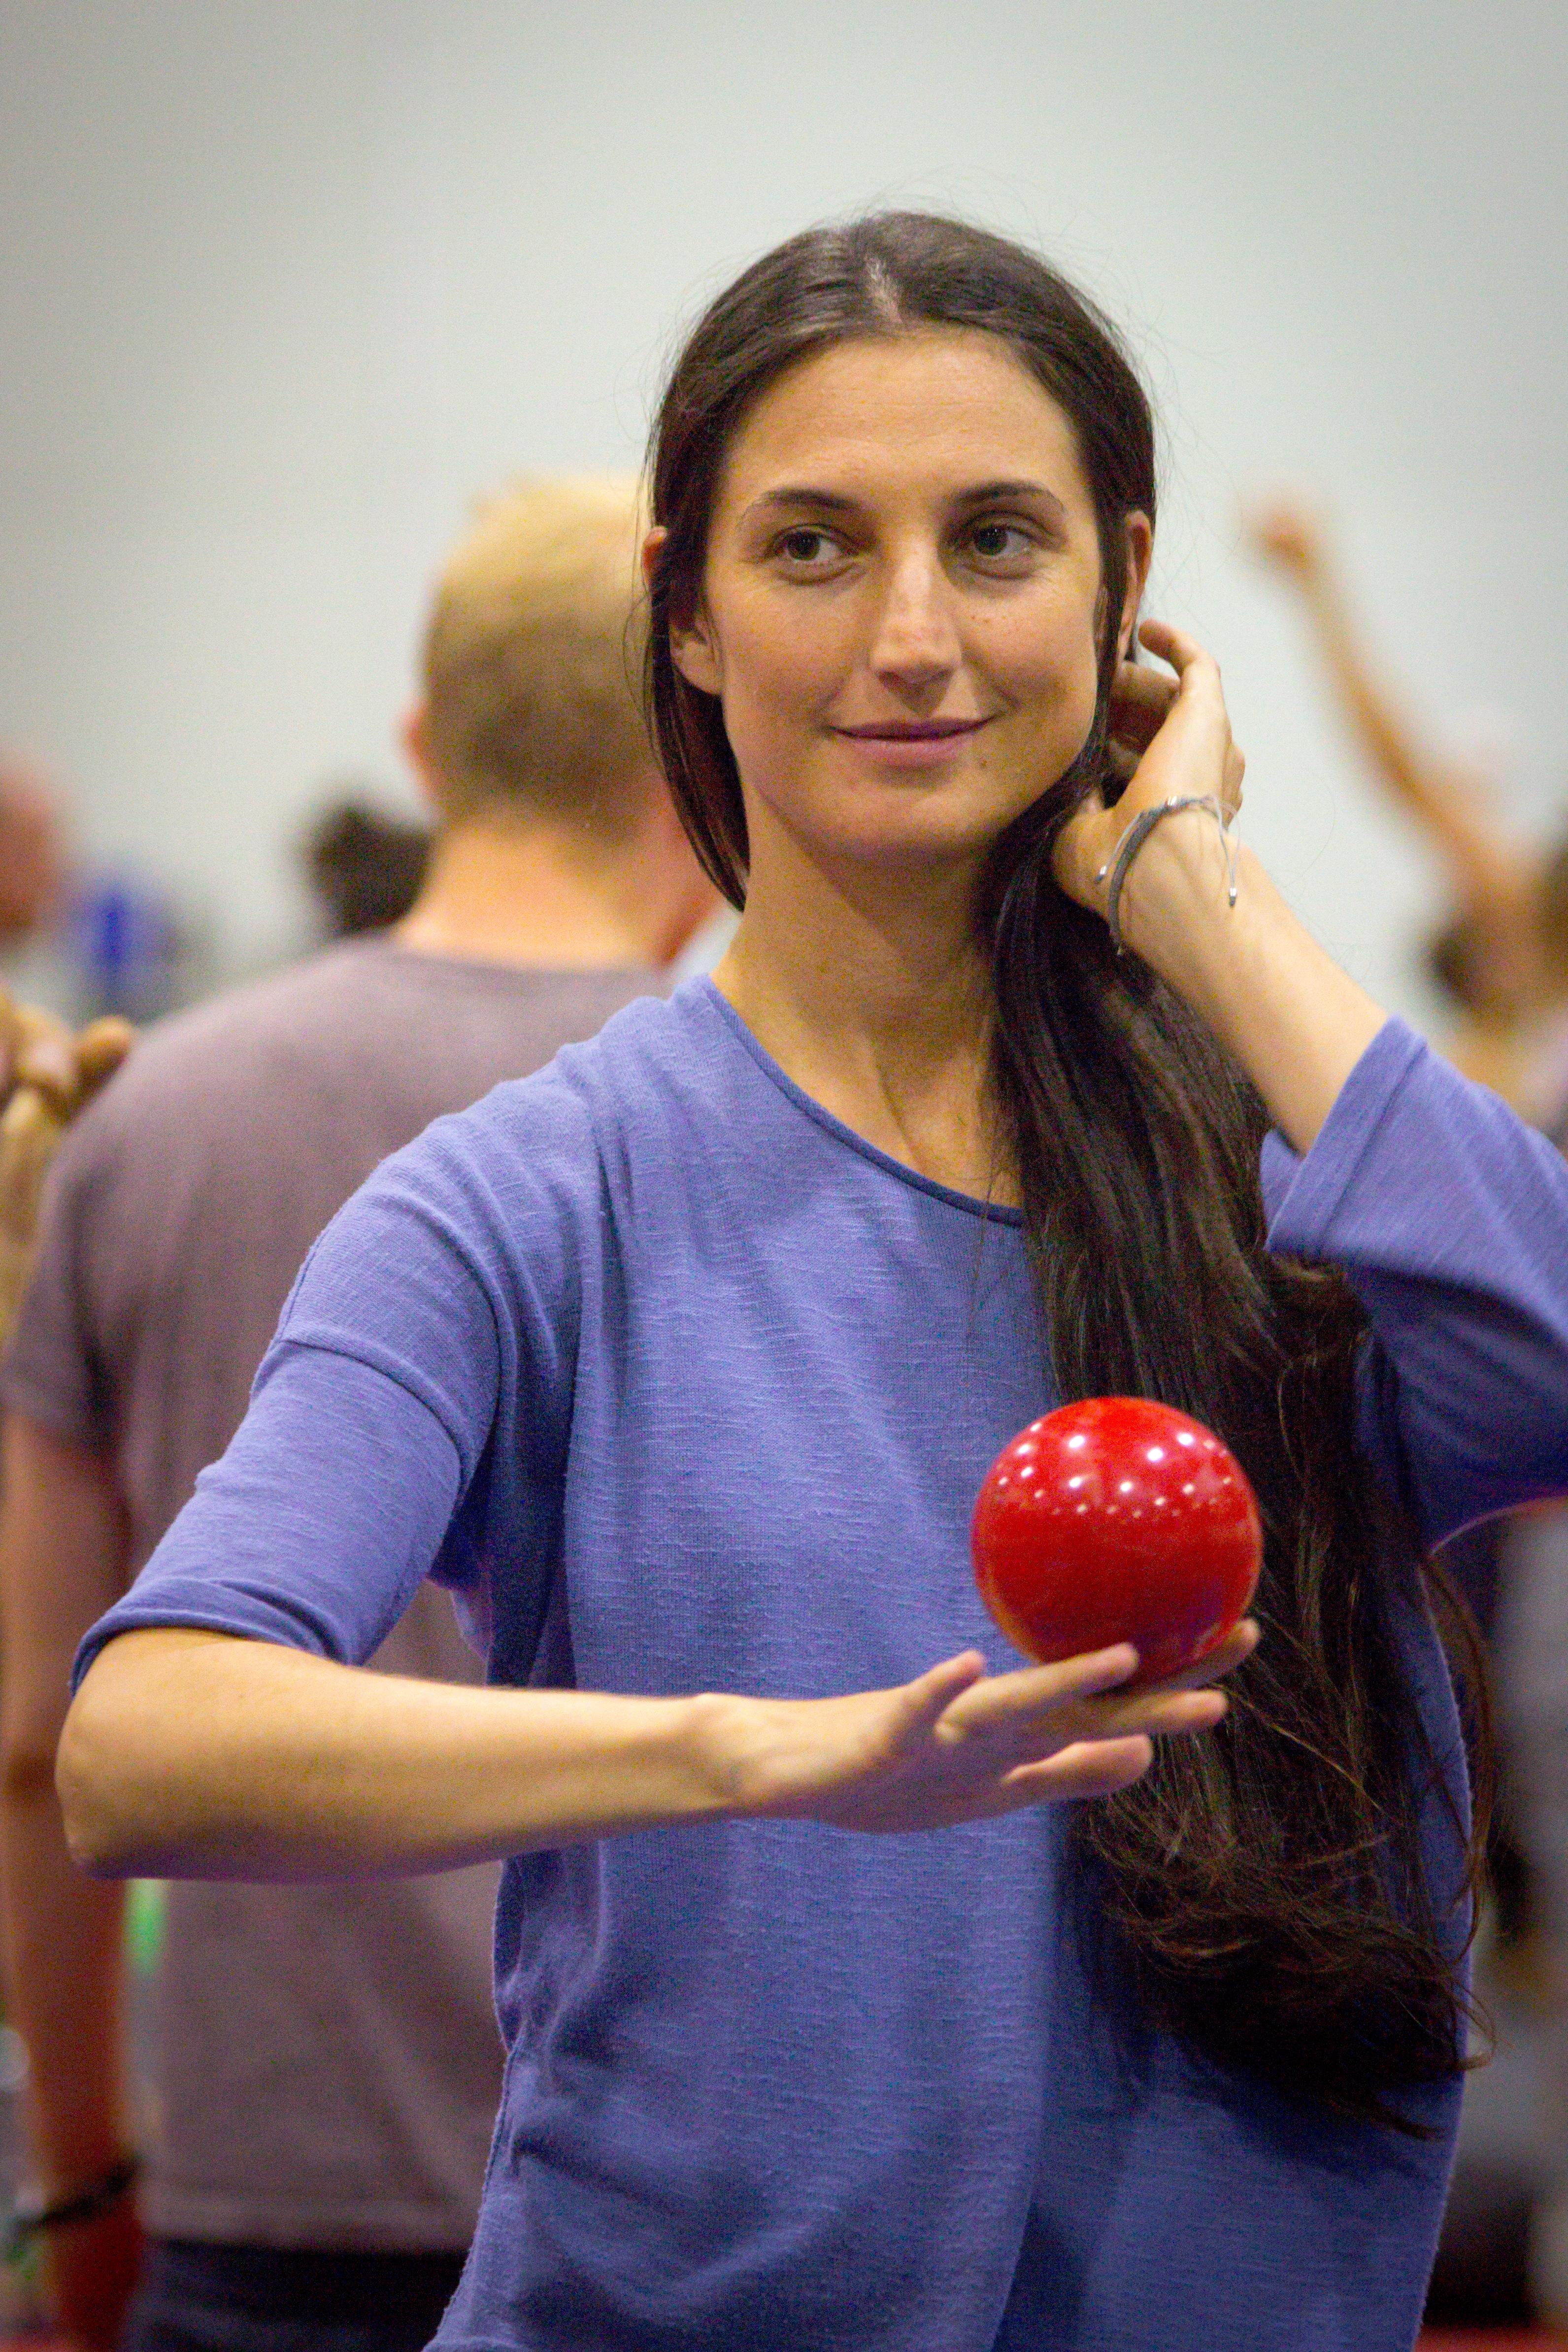 EJC 2017 Lublin Day 4: Main hall juggling.